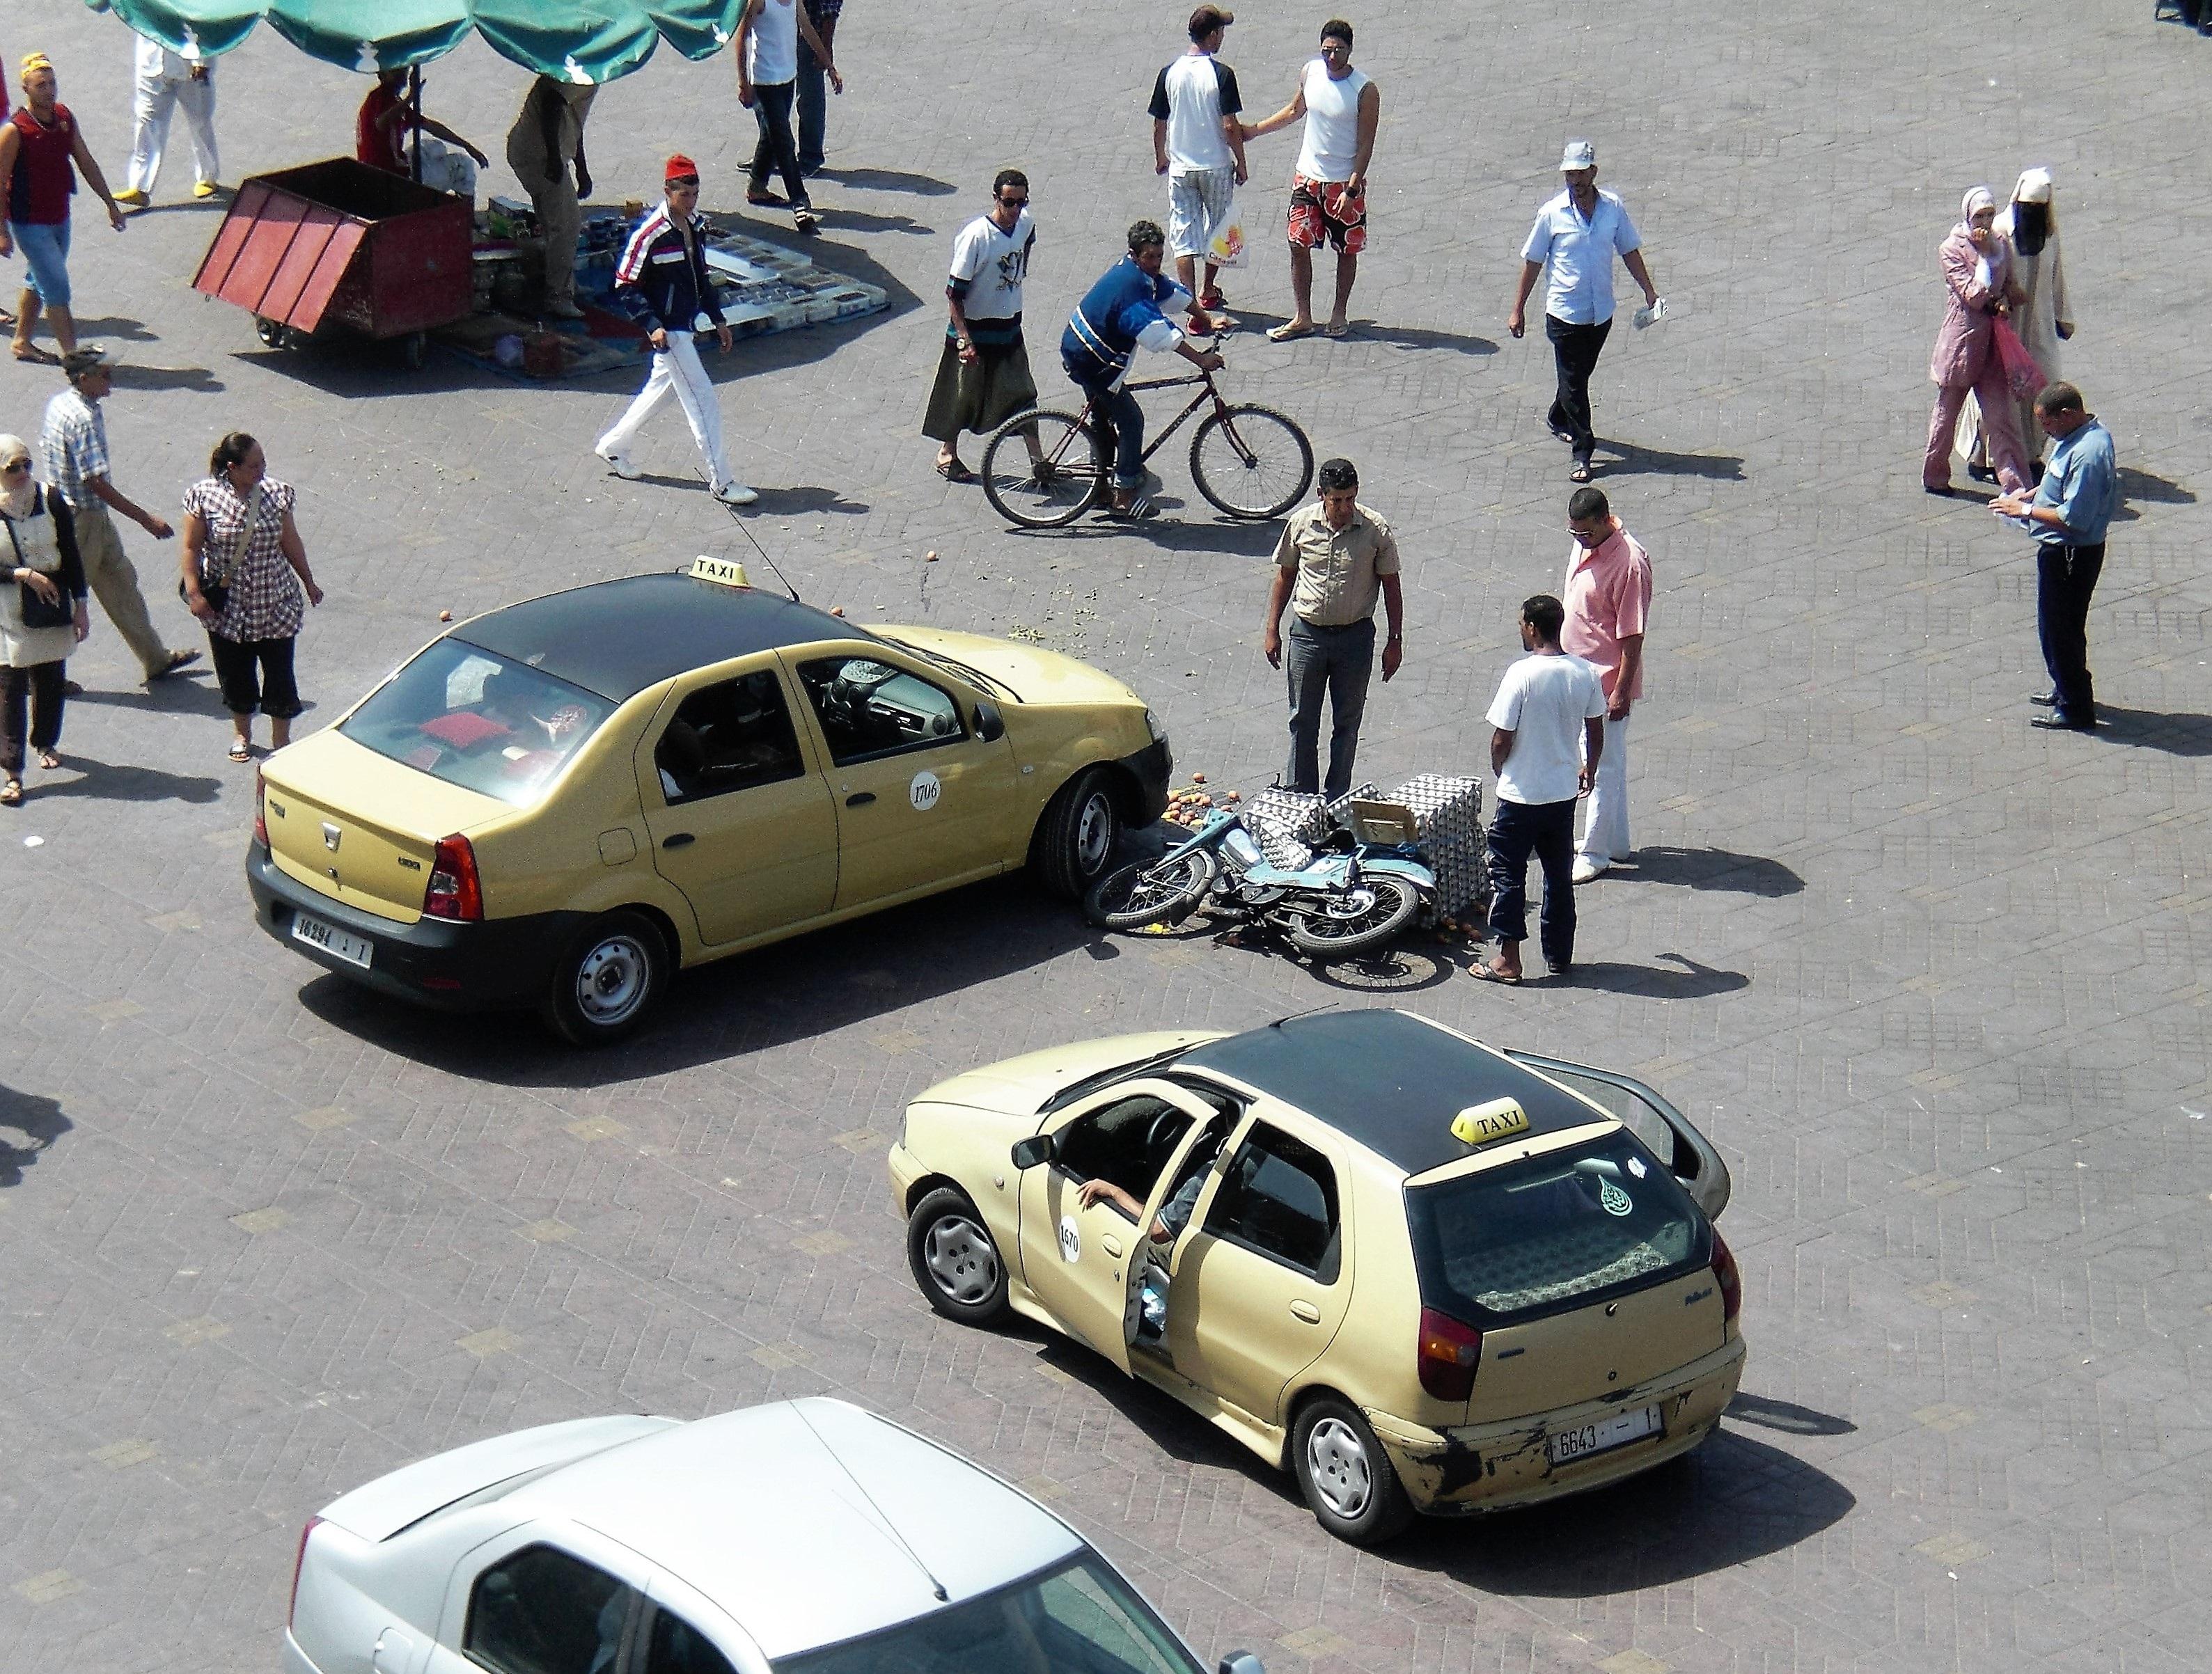 Kostenlose foto : Auto, Taxi, Transport, Fahrzeug, gebrochen, Eier ...